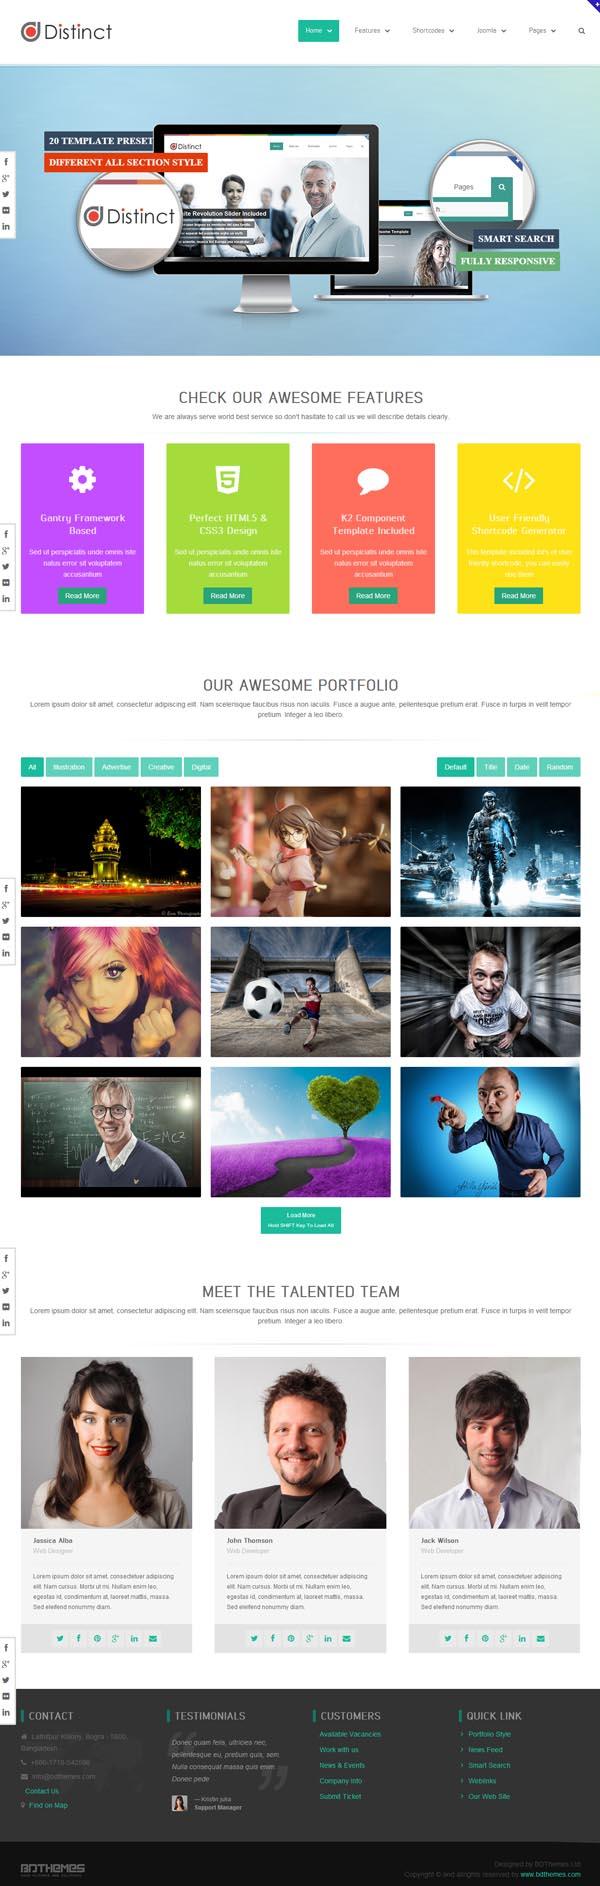 Distinct - Multi-purpose Joomla Template